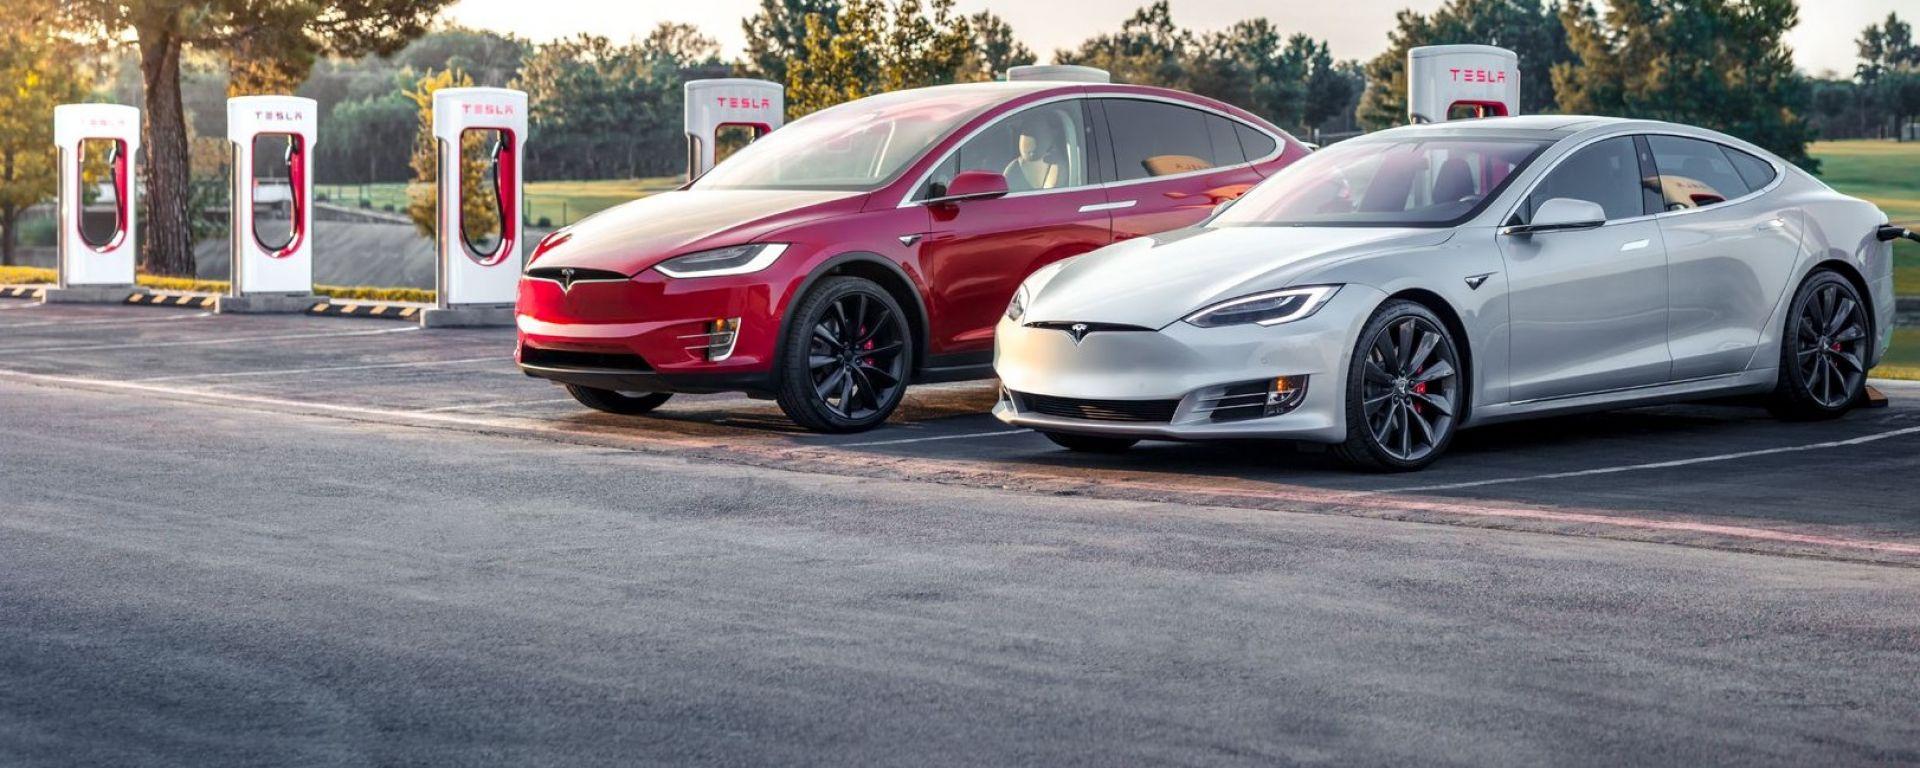 Tesla Model X 75D e Model S 75D, game over